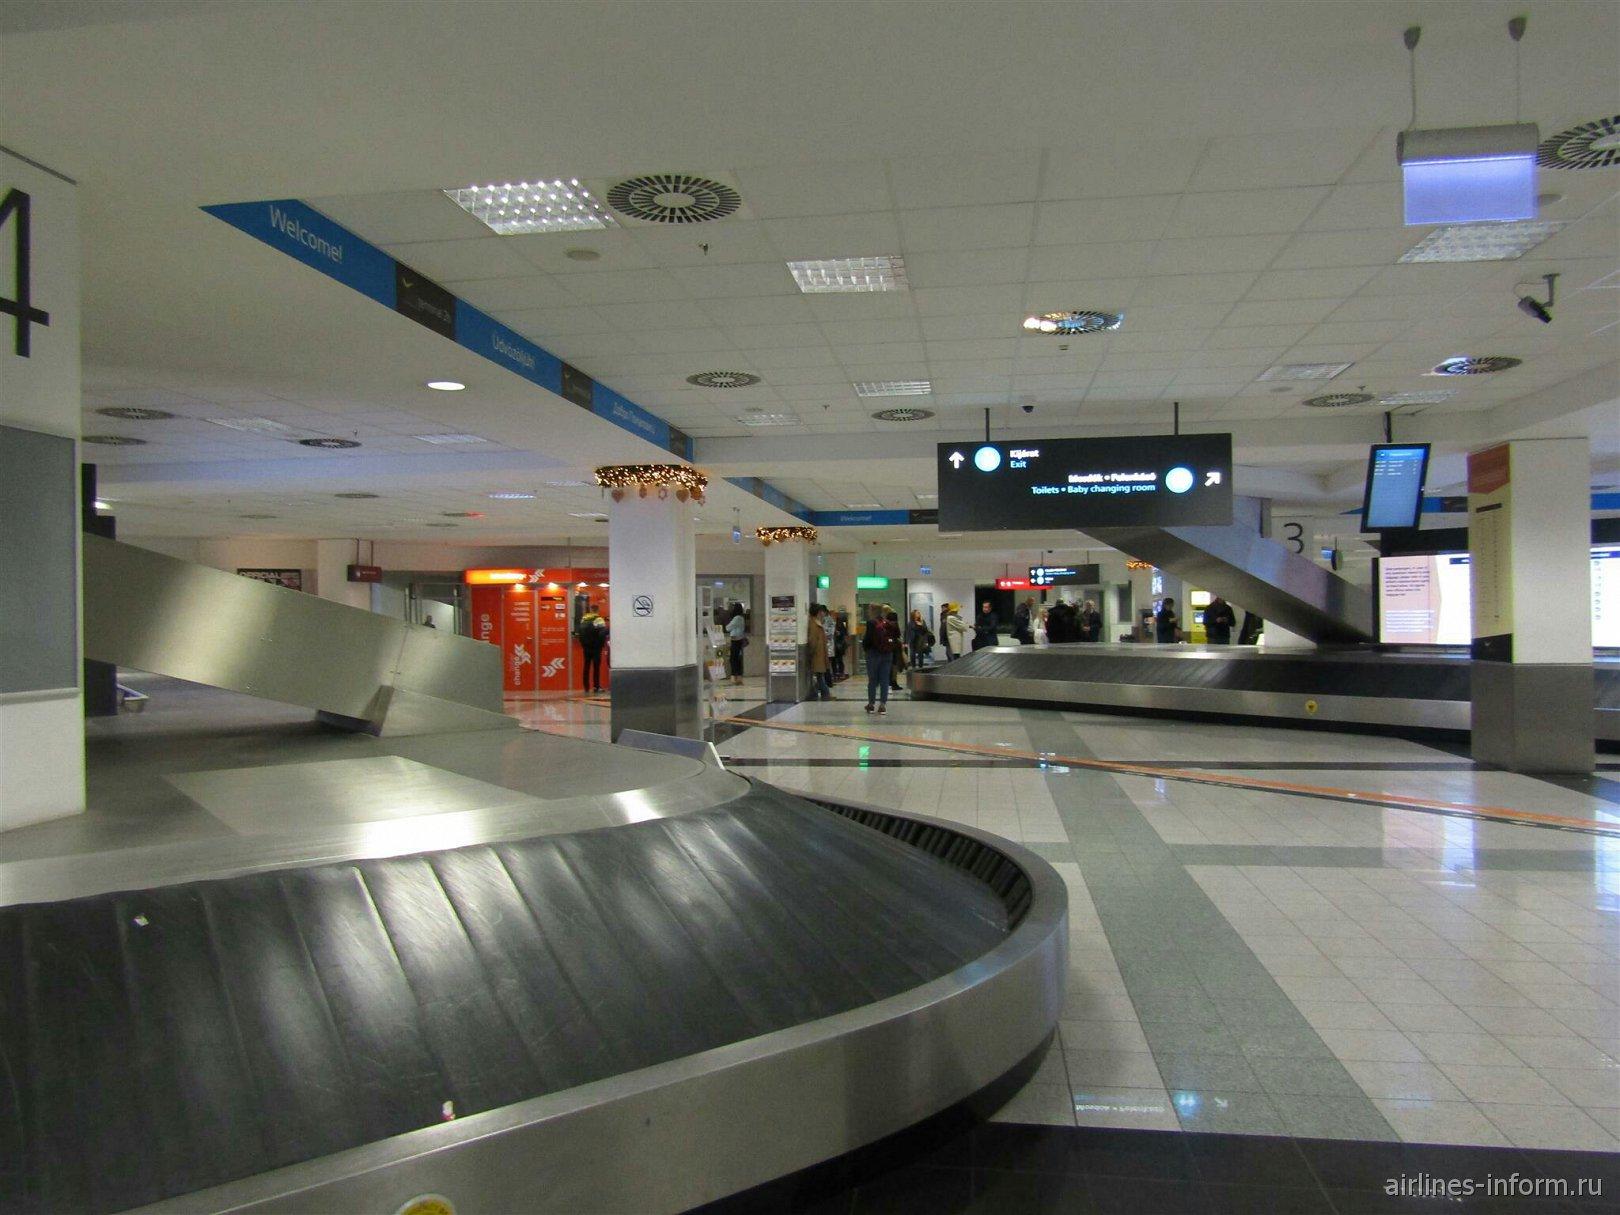 Зона выдачи багажа в терминале 2 аэропорта Будапешта